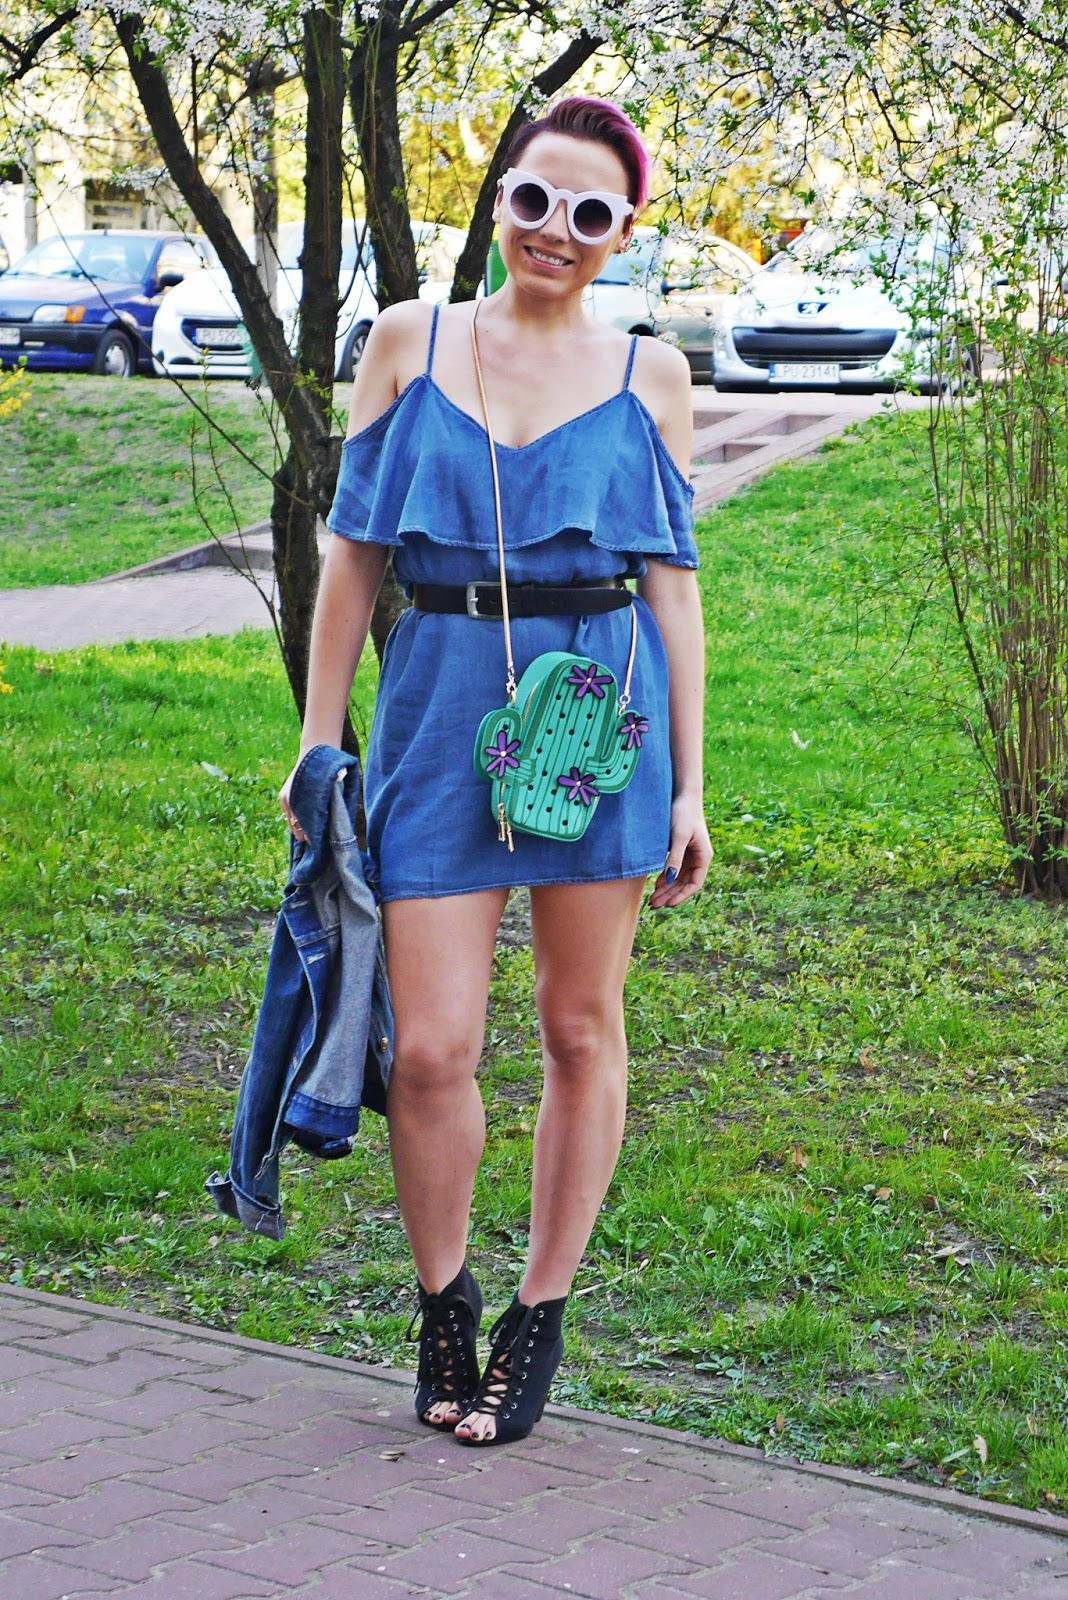 denim_dress_cactus_bag_zaful_sammydress_karyn_look_ootd_outfit_120417b